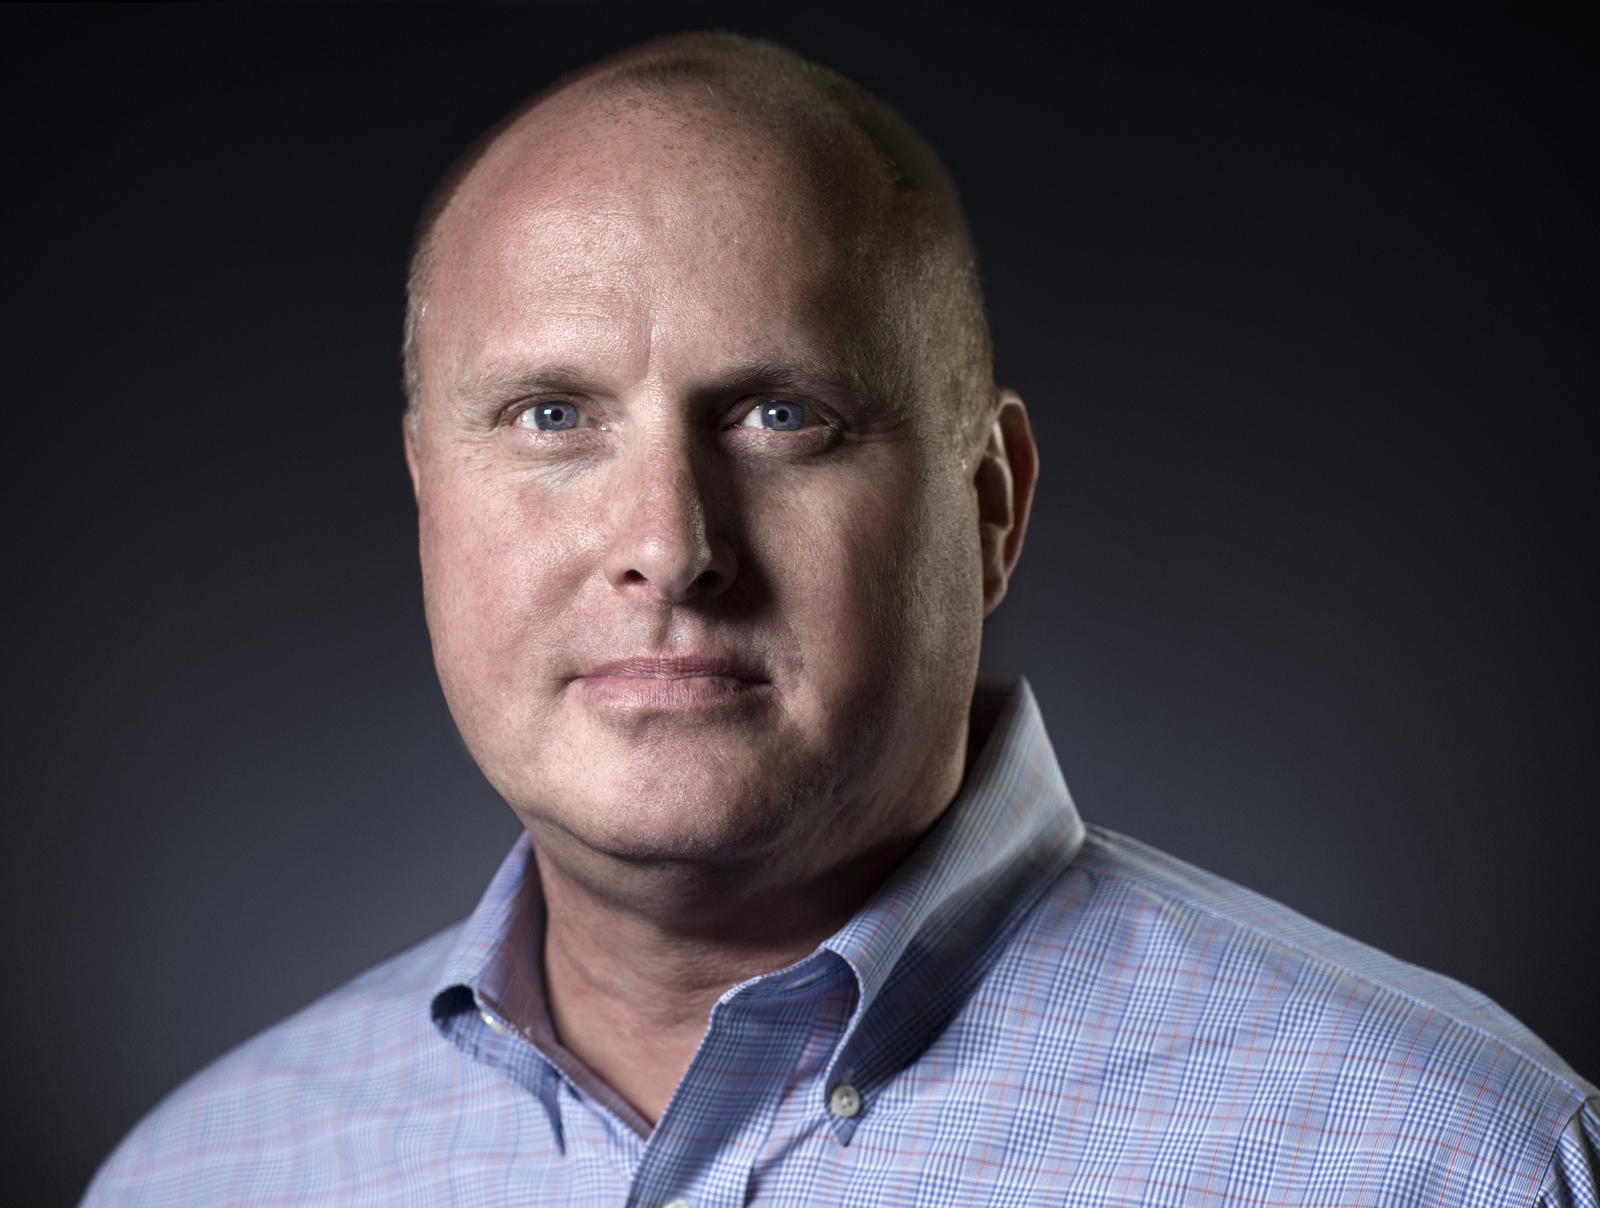 John Smedley, CEO of Daybreak Games